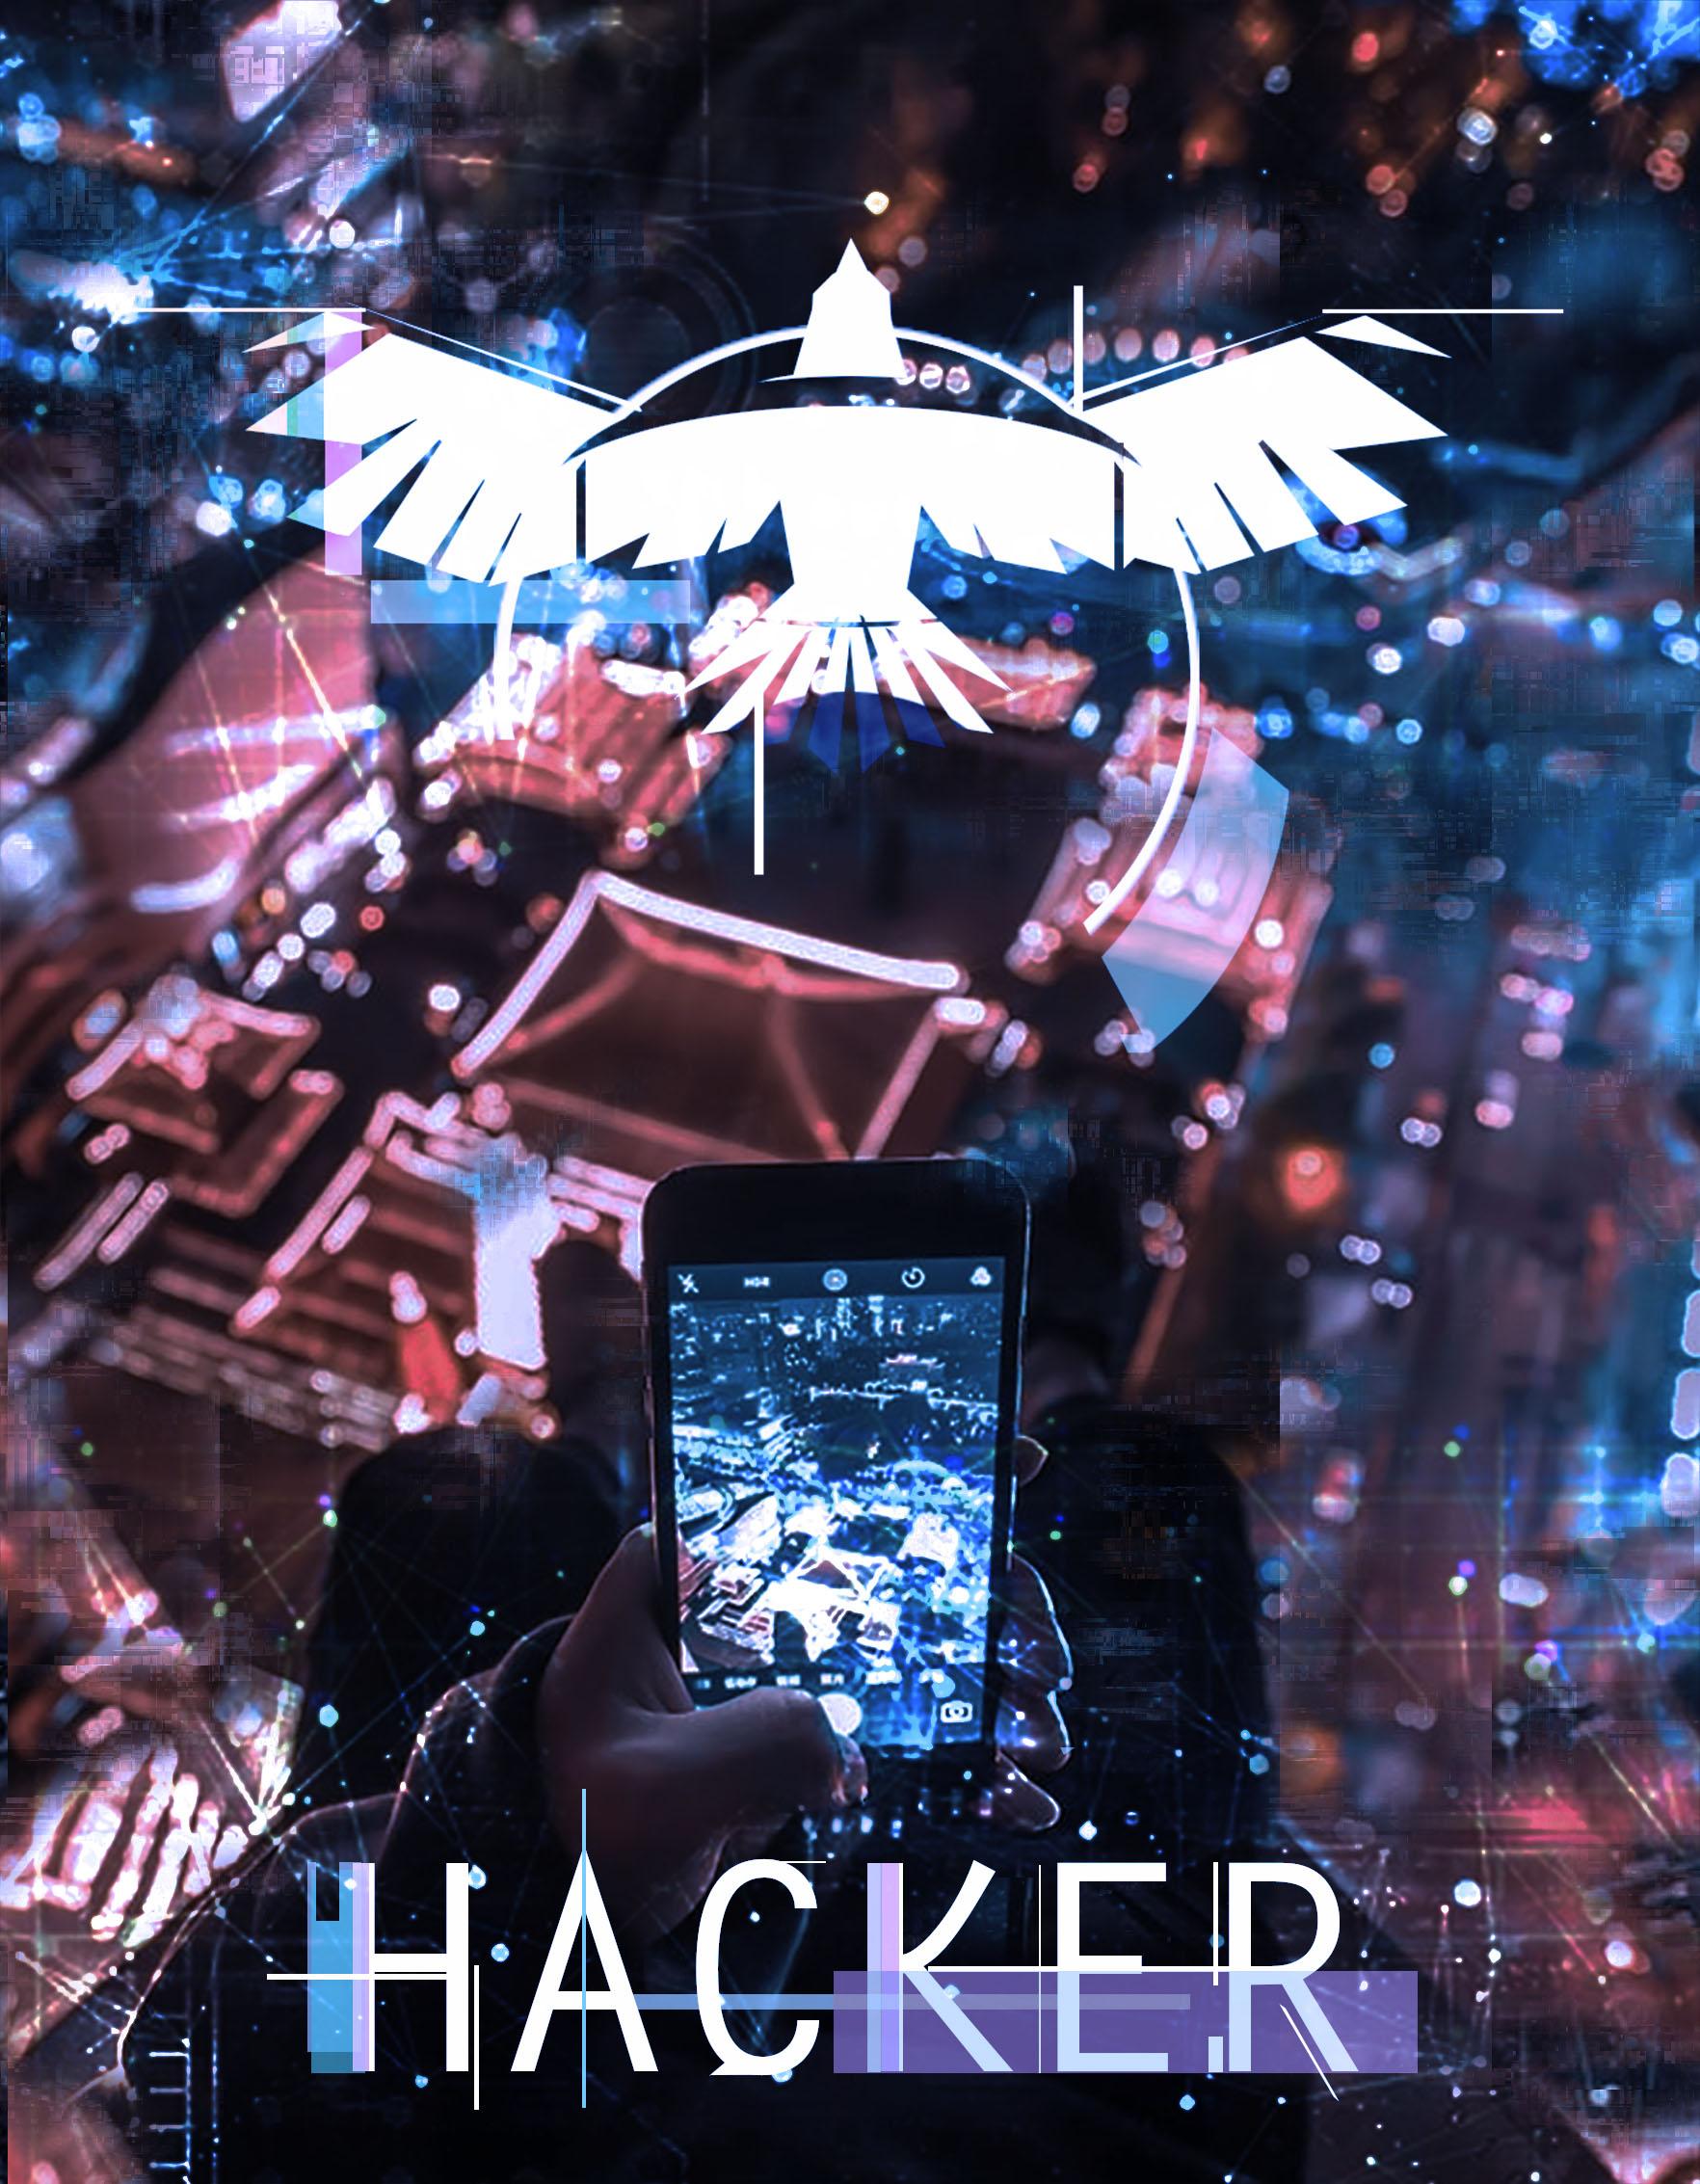 Hacker - AR Mobile Game